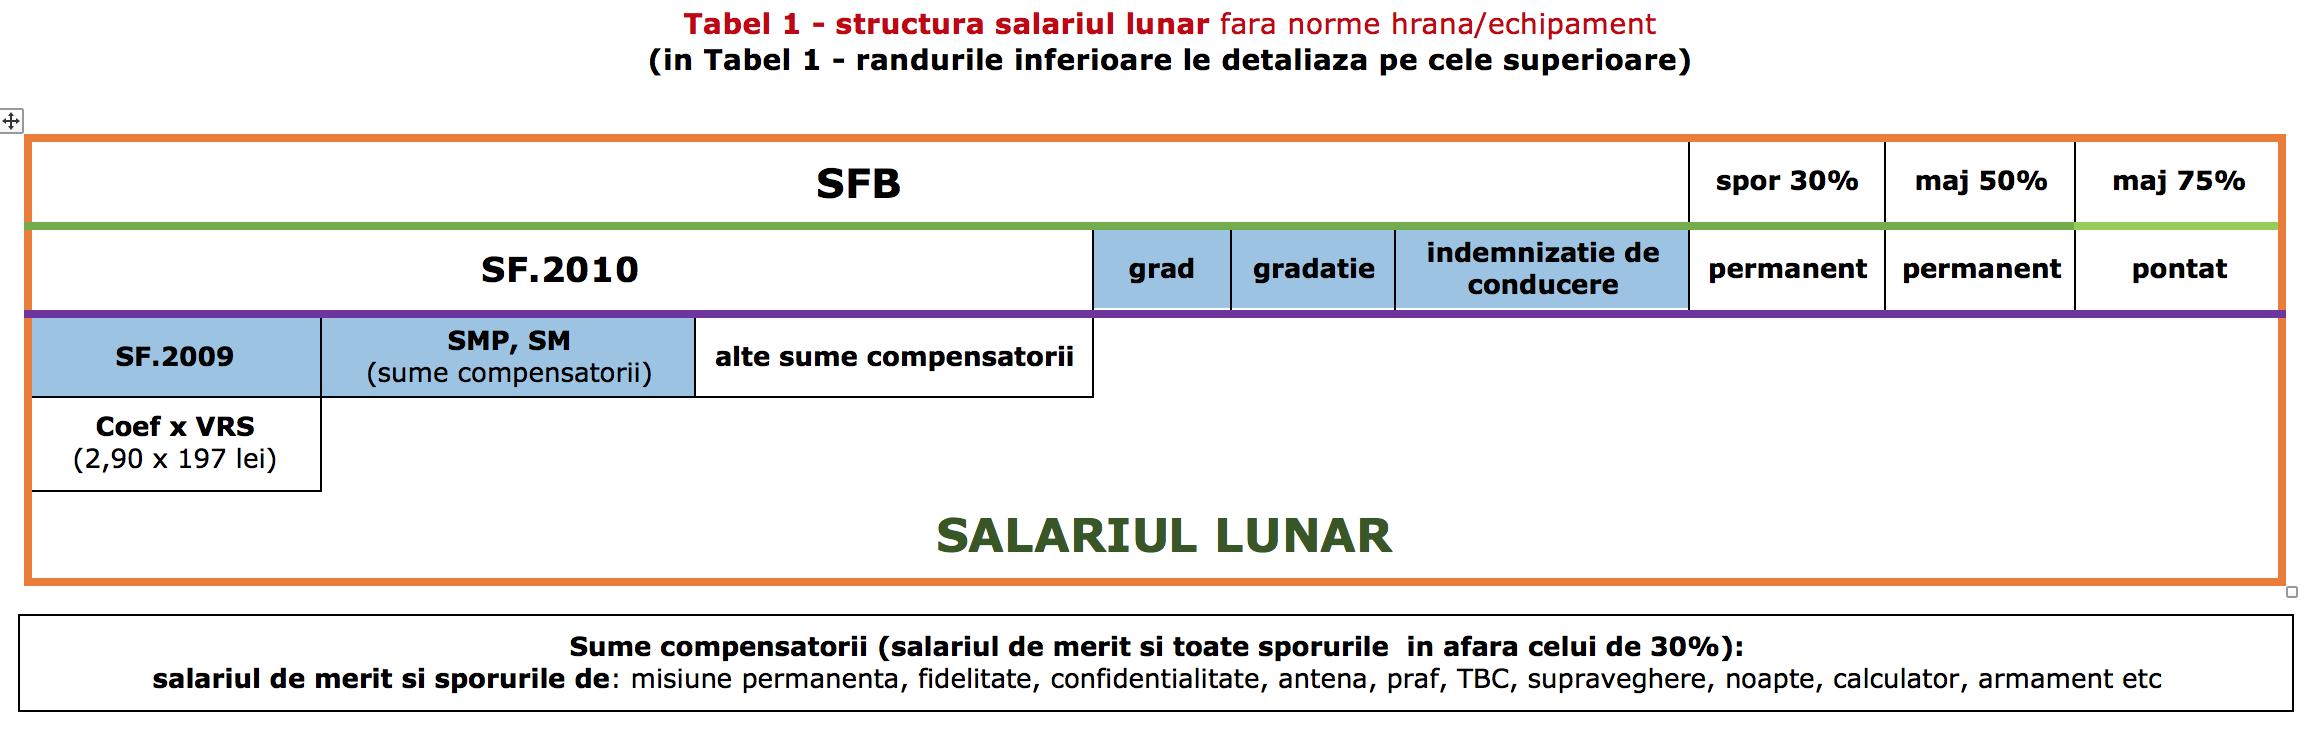 Tabel 1 structura salariu